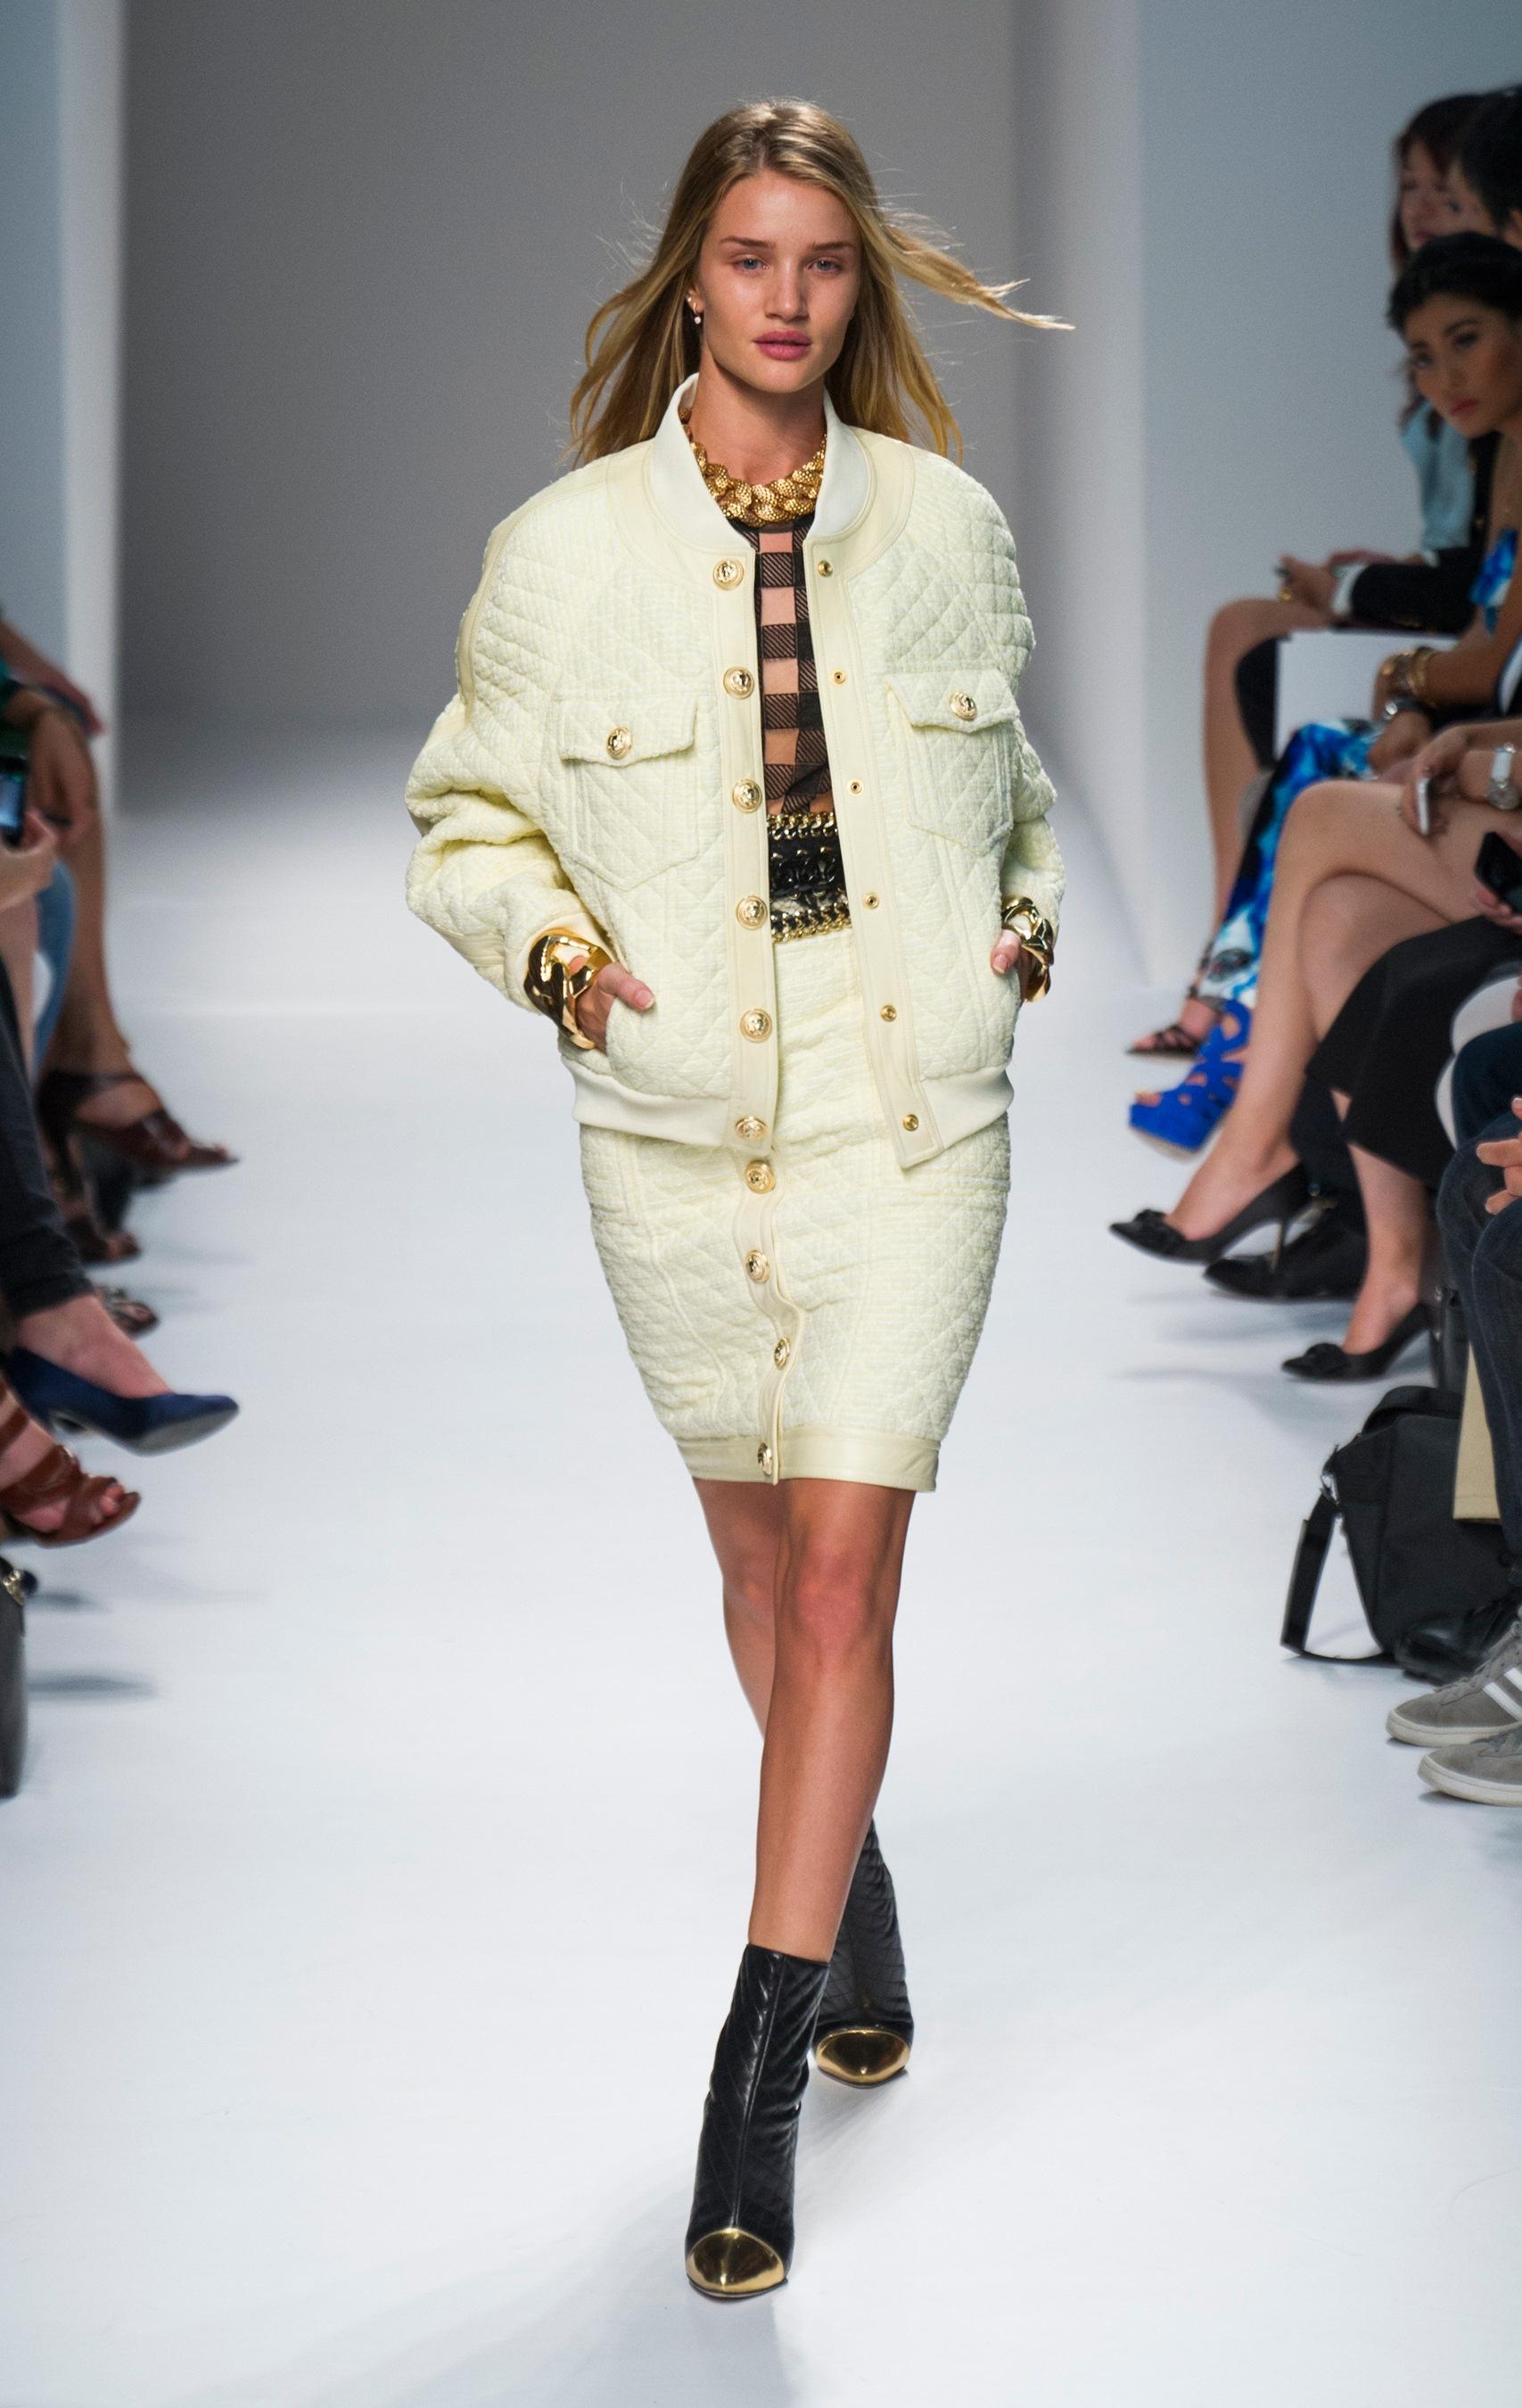 Rosie Huntington-Whiteley walks for Balmain at Paris Fashion Week